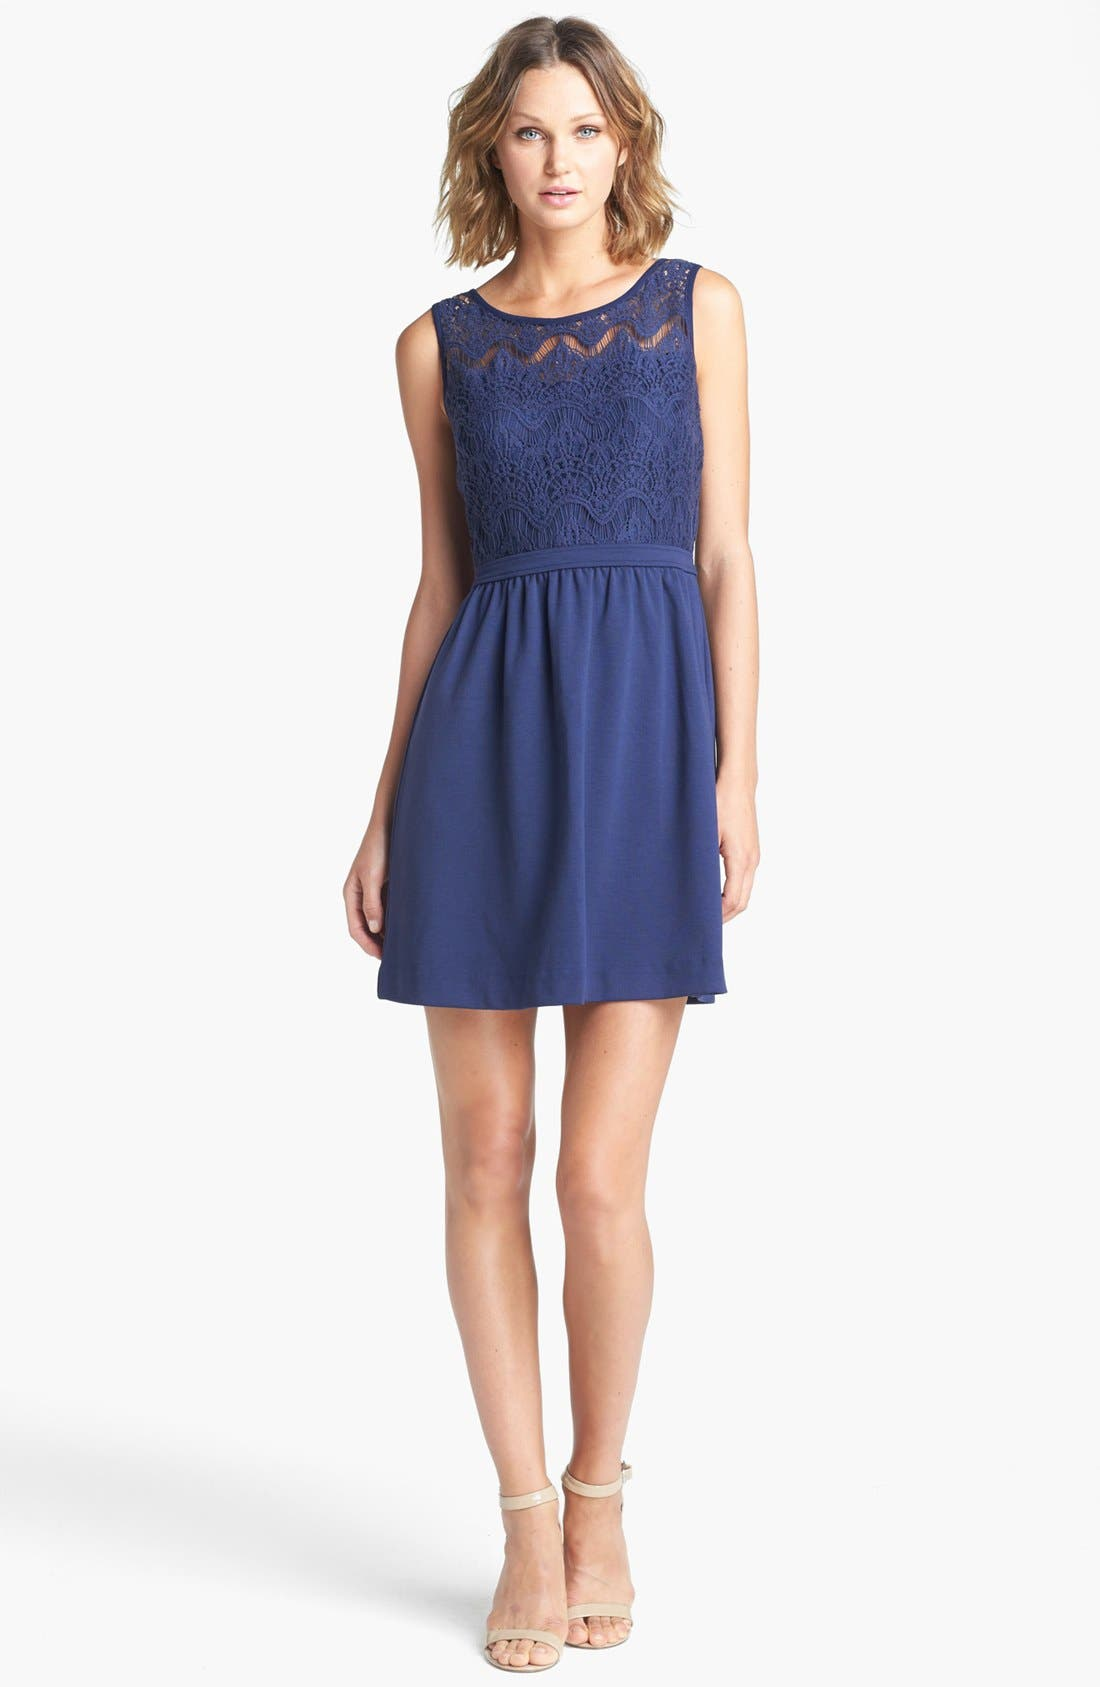 Main Image - Lilly Pulitzer® 'Rhea' Mixed Media Fit & Flare Dress